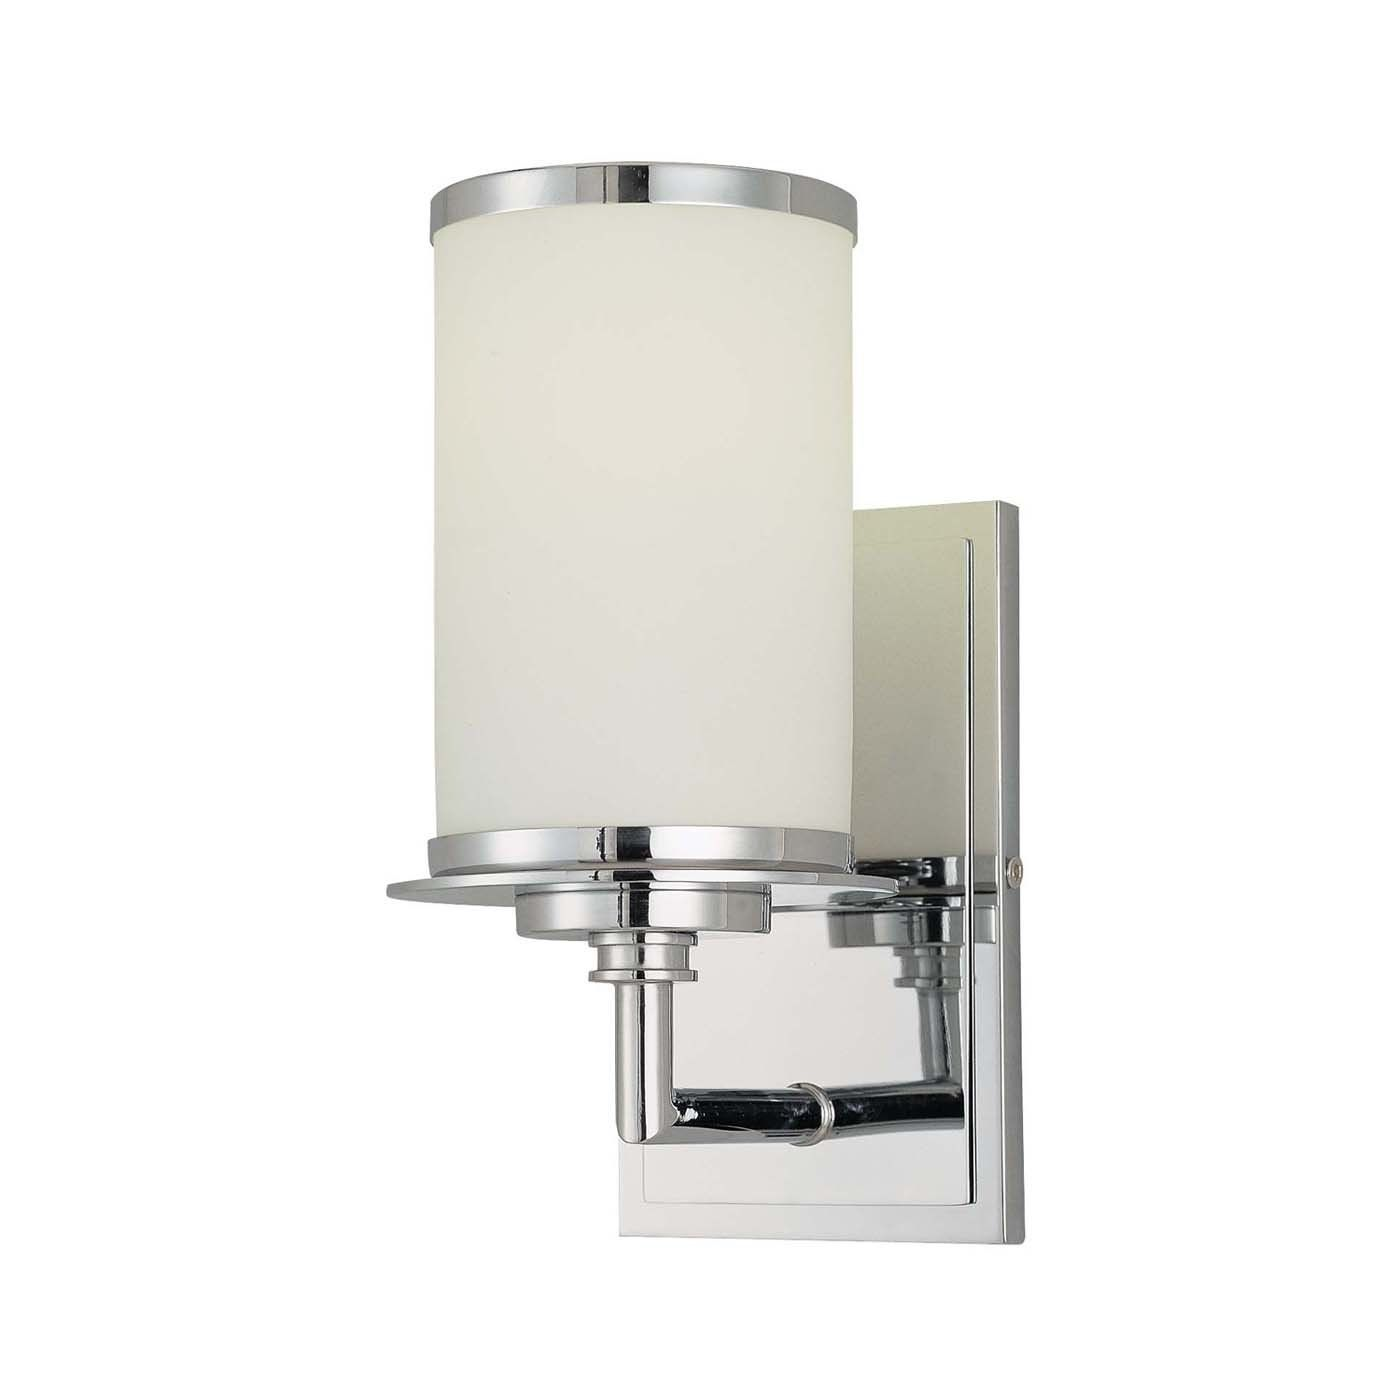 Leila Bath Wall Sconce  Need 2 Minka Lavery 372177Pl Glass Note New Minka Lavery Bathroom Lighting Decorating Design